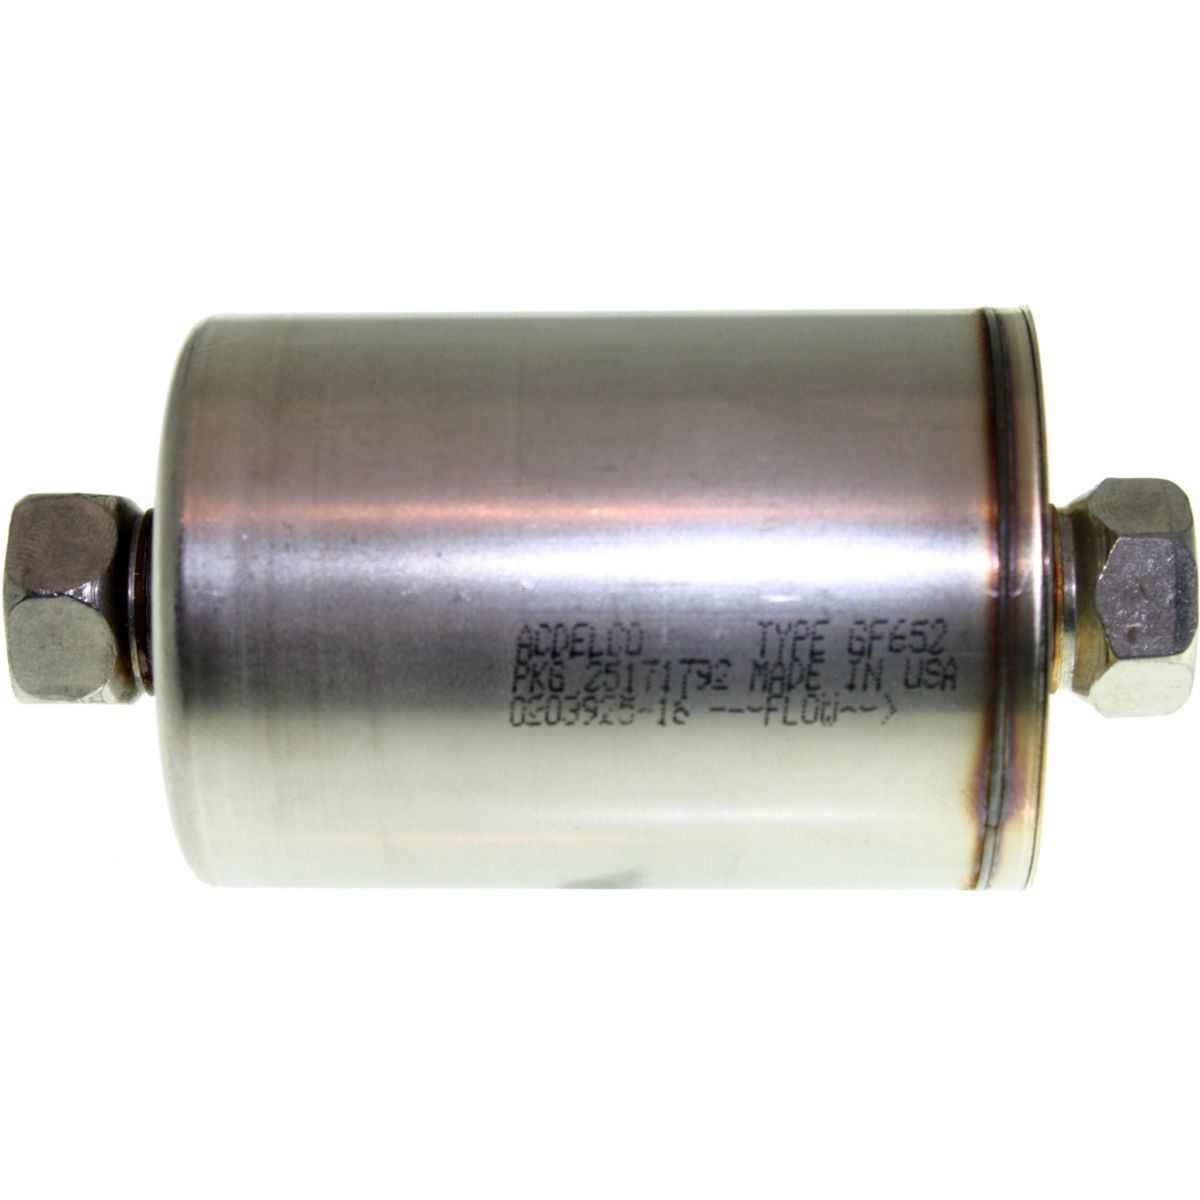 Pontiac Grand Am Fuel Filter Wiring Library Subaru Impreza Instrumentenhalter Ac Delco Gas New Olds J2000 Gf652